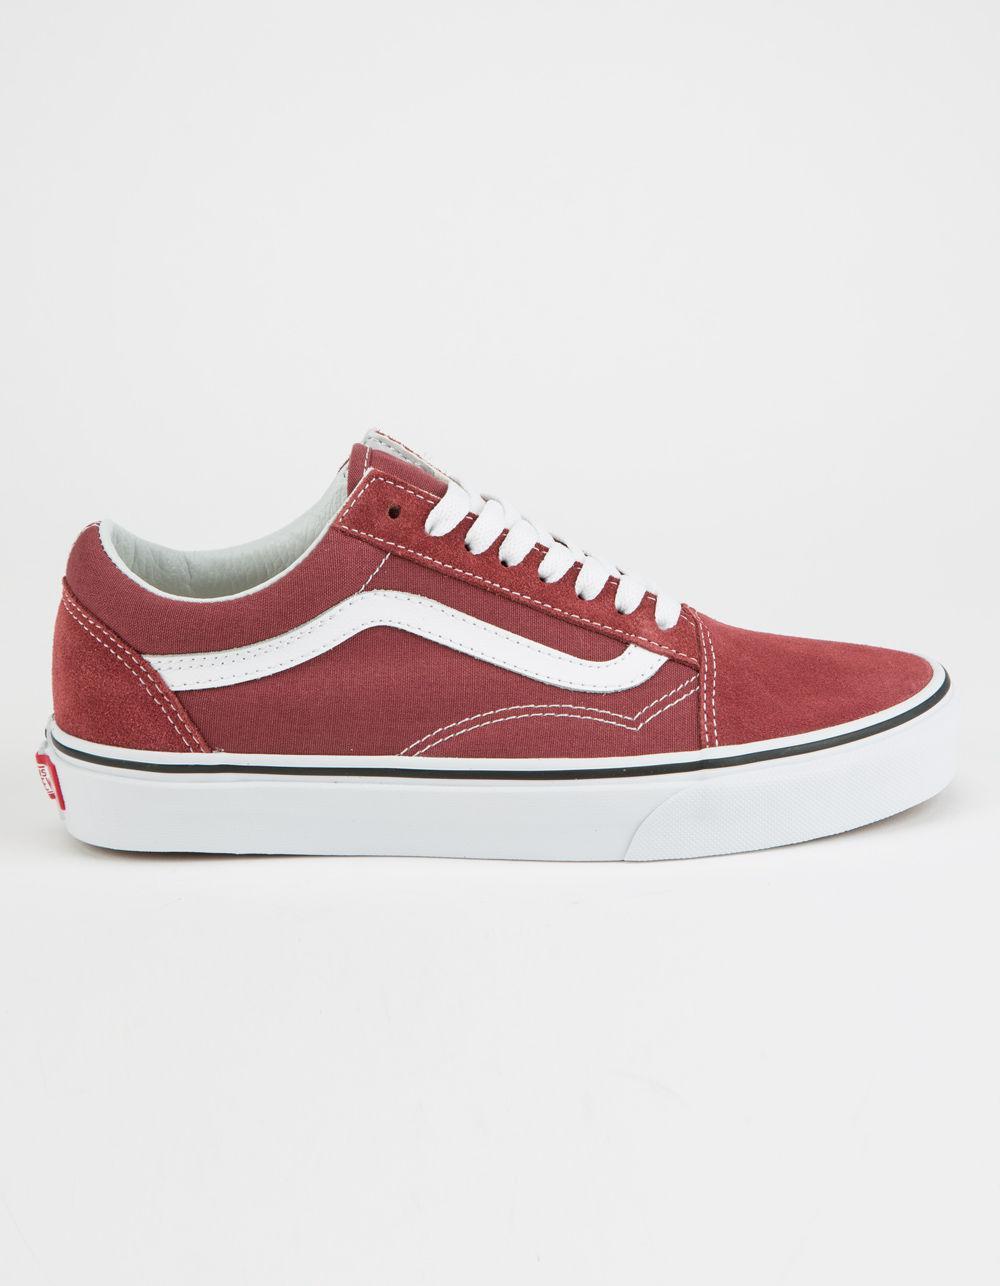 1f354859ea Lyst - Vans Old Skool Apple Butter   True White Womens Shoes